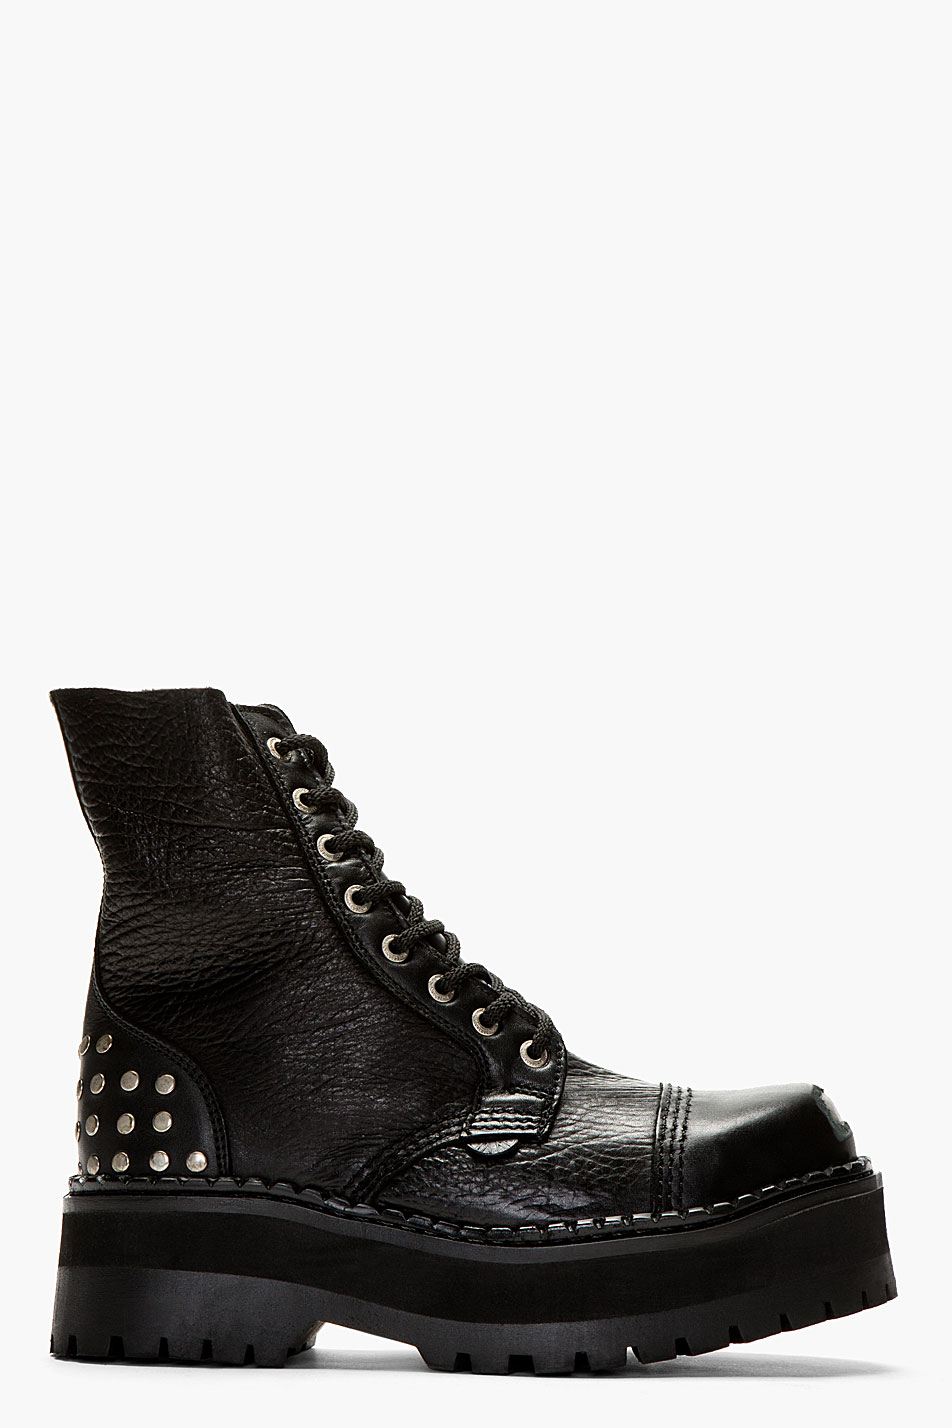 Underground Black Leather Steel Toe Platform Combat Boots